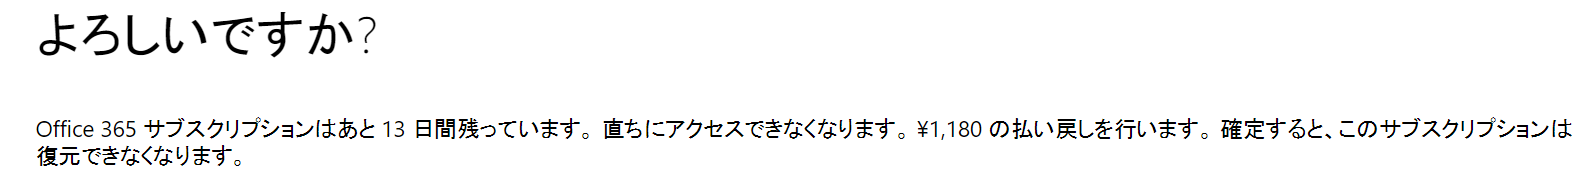 2017-01-03_181719